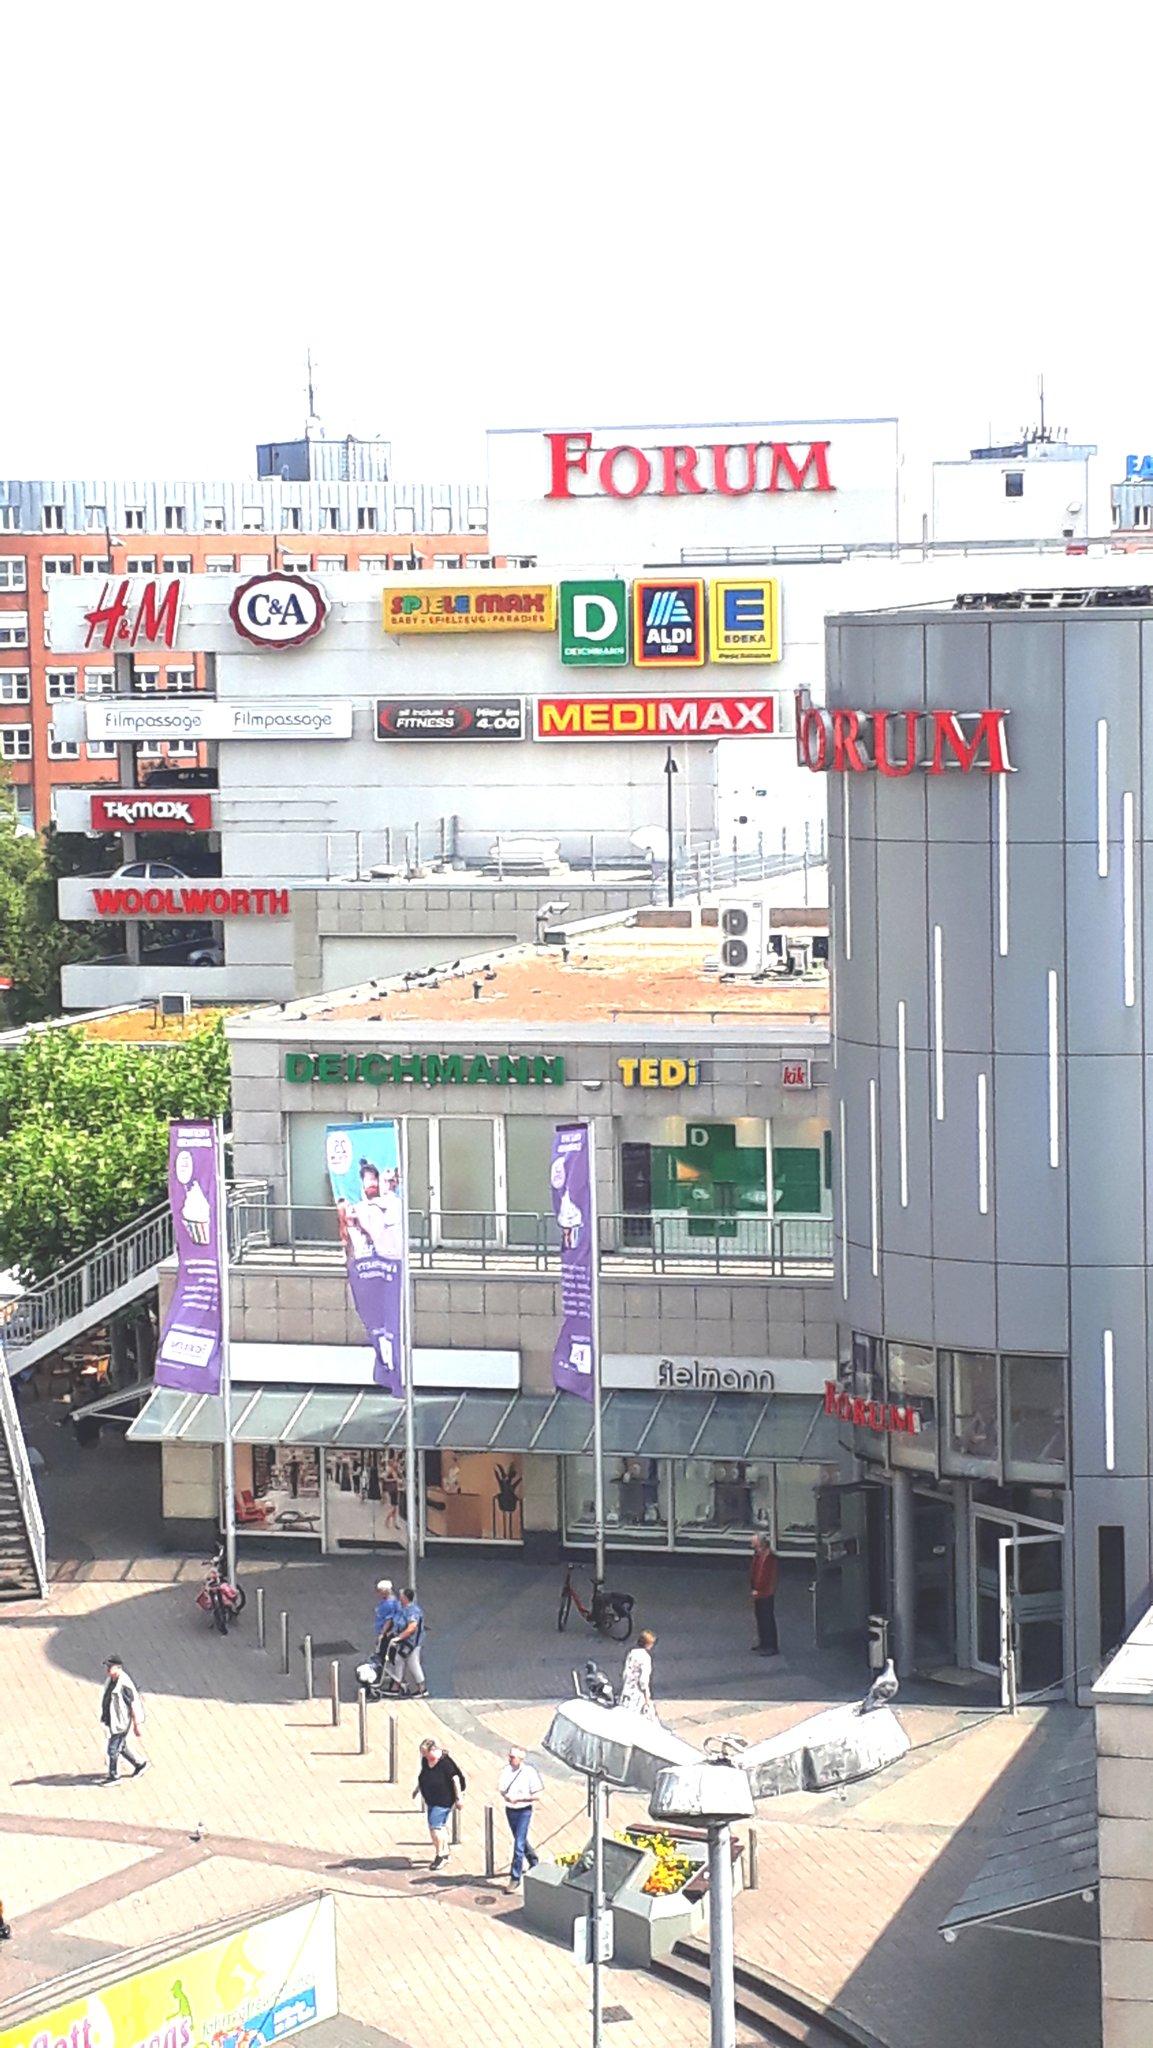 Forum Kino Mülheim Programm